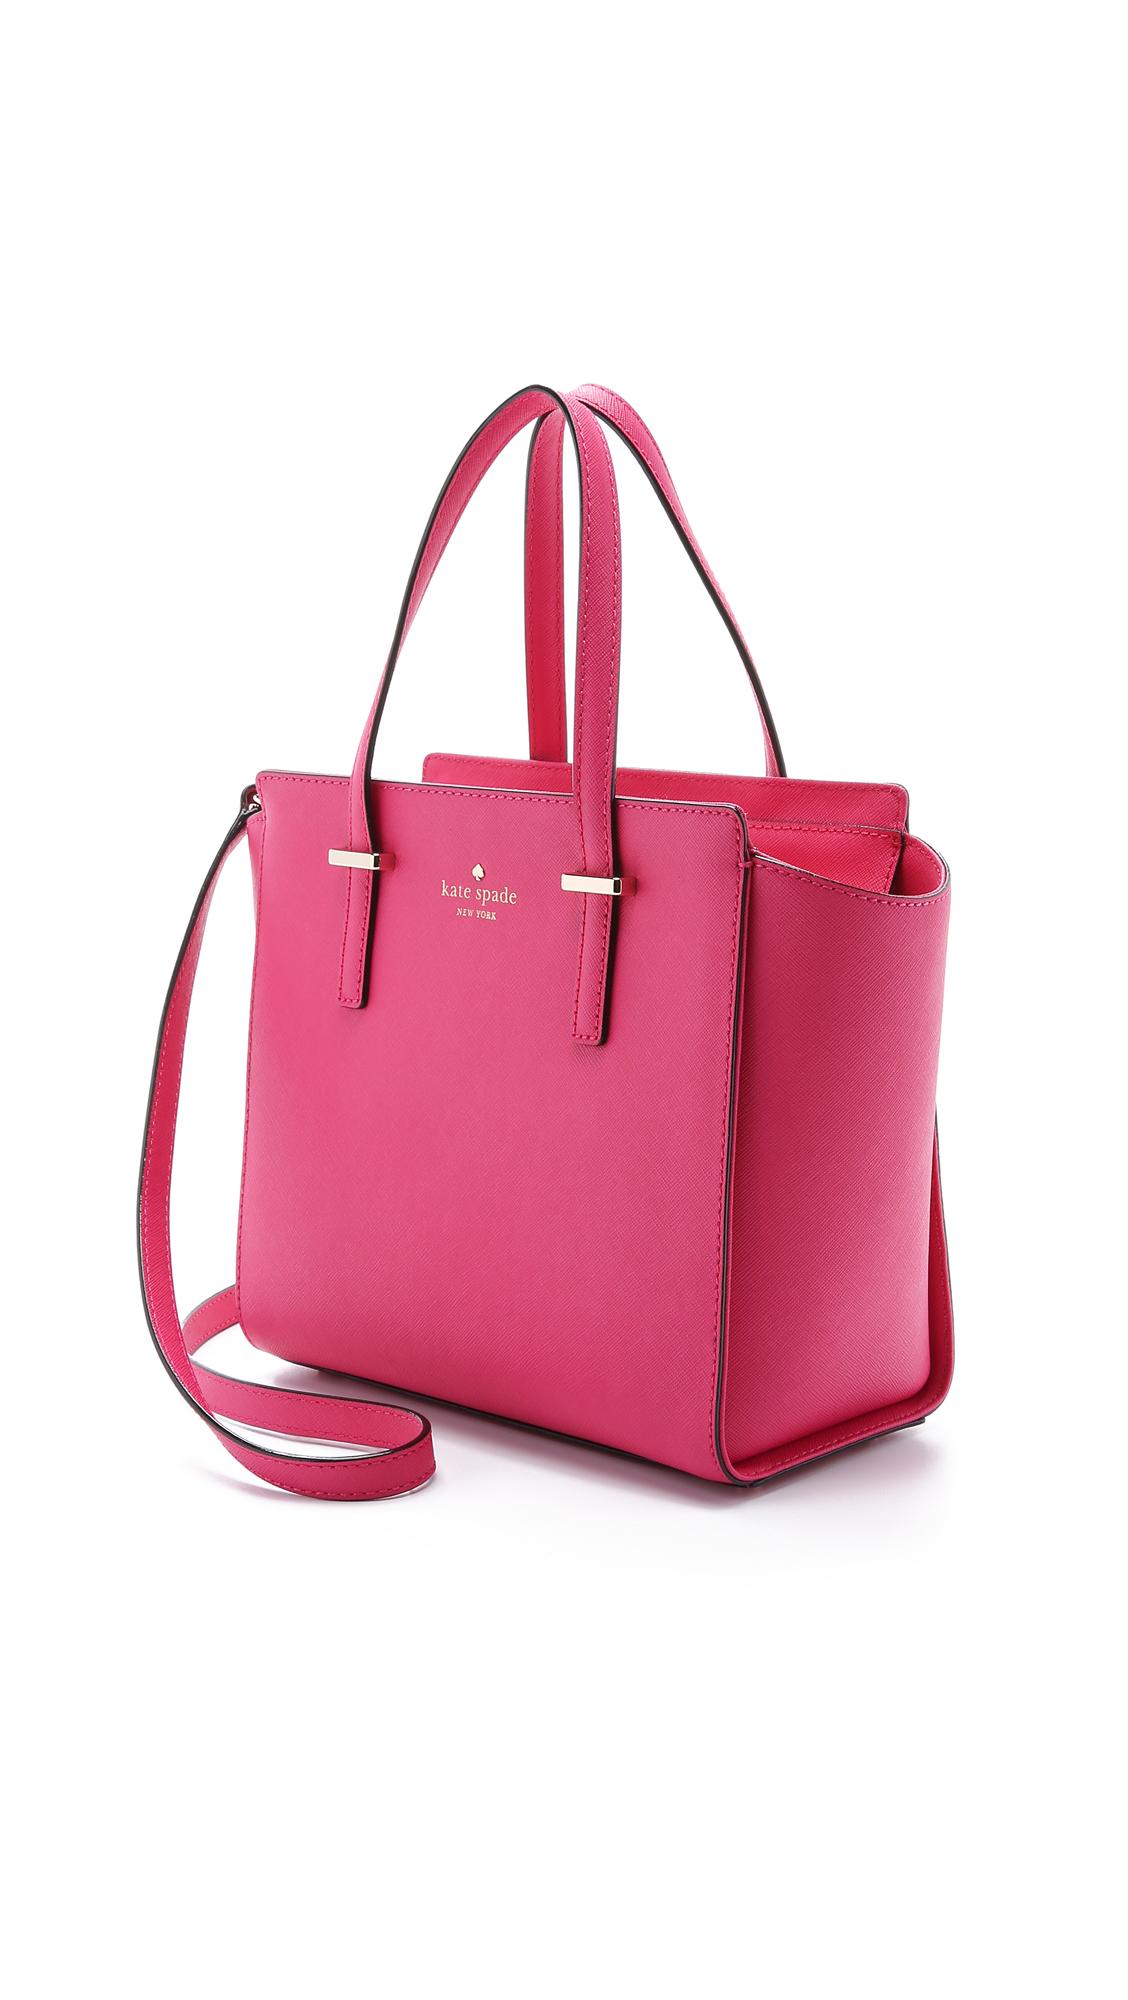 Kate spade Small Hayden Satchel - Sweetheart Pink in Pink ...